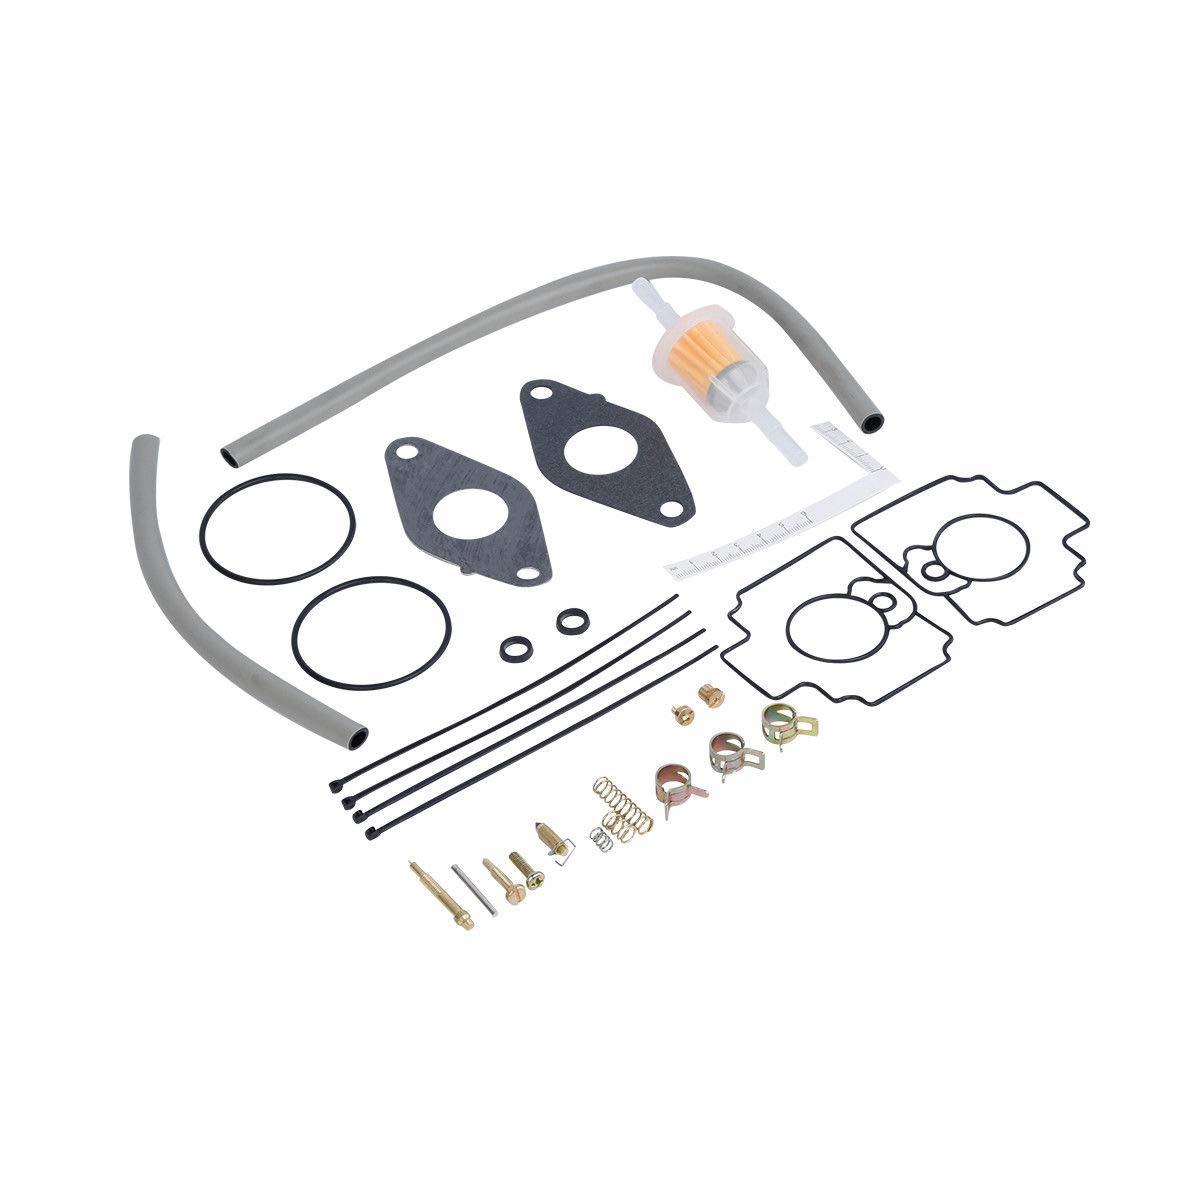 FD620 FD620D Carb Tengchang Carburetor Rebuild Kit Fit for John ...